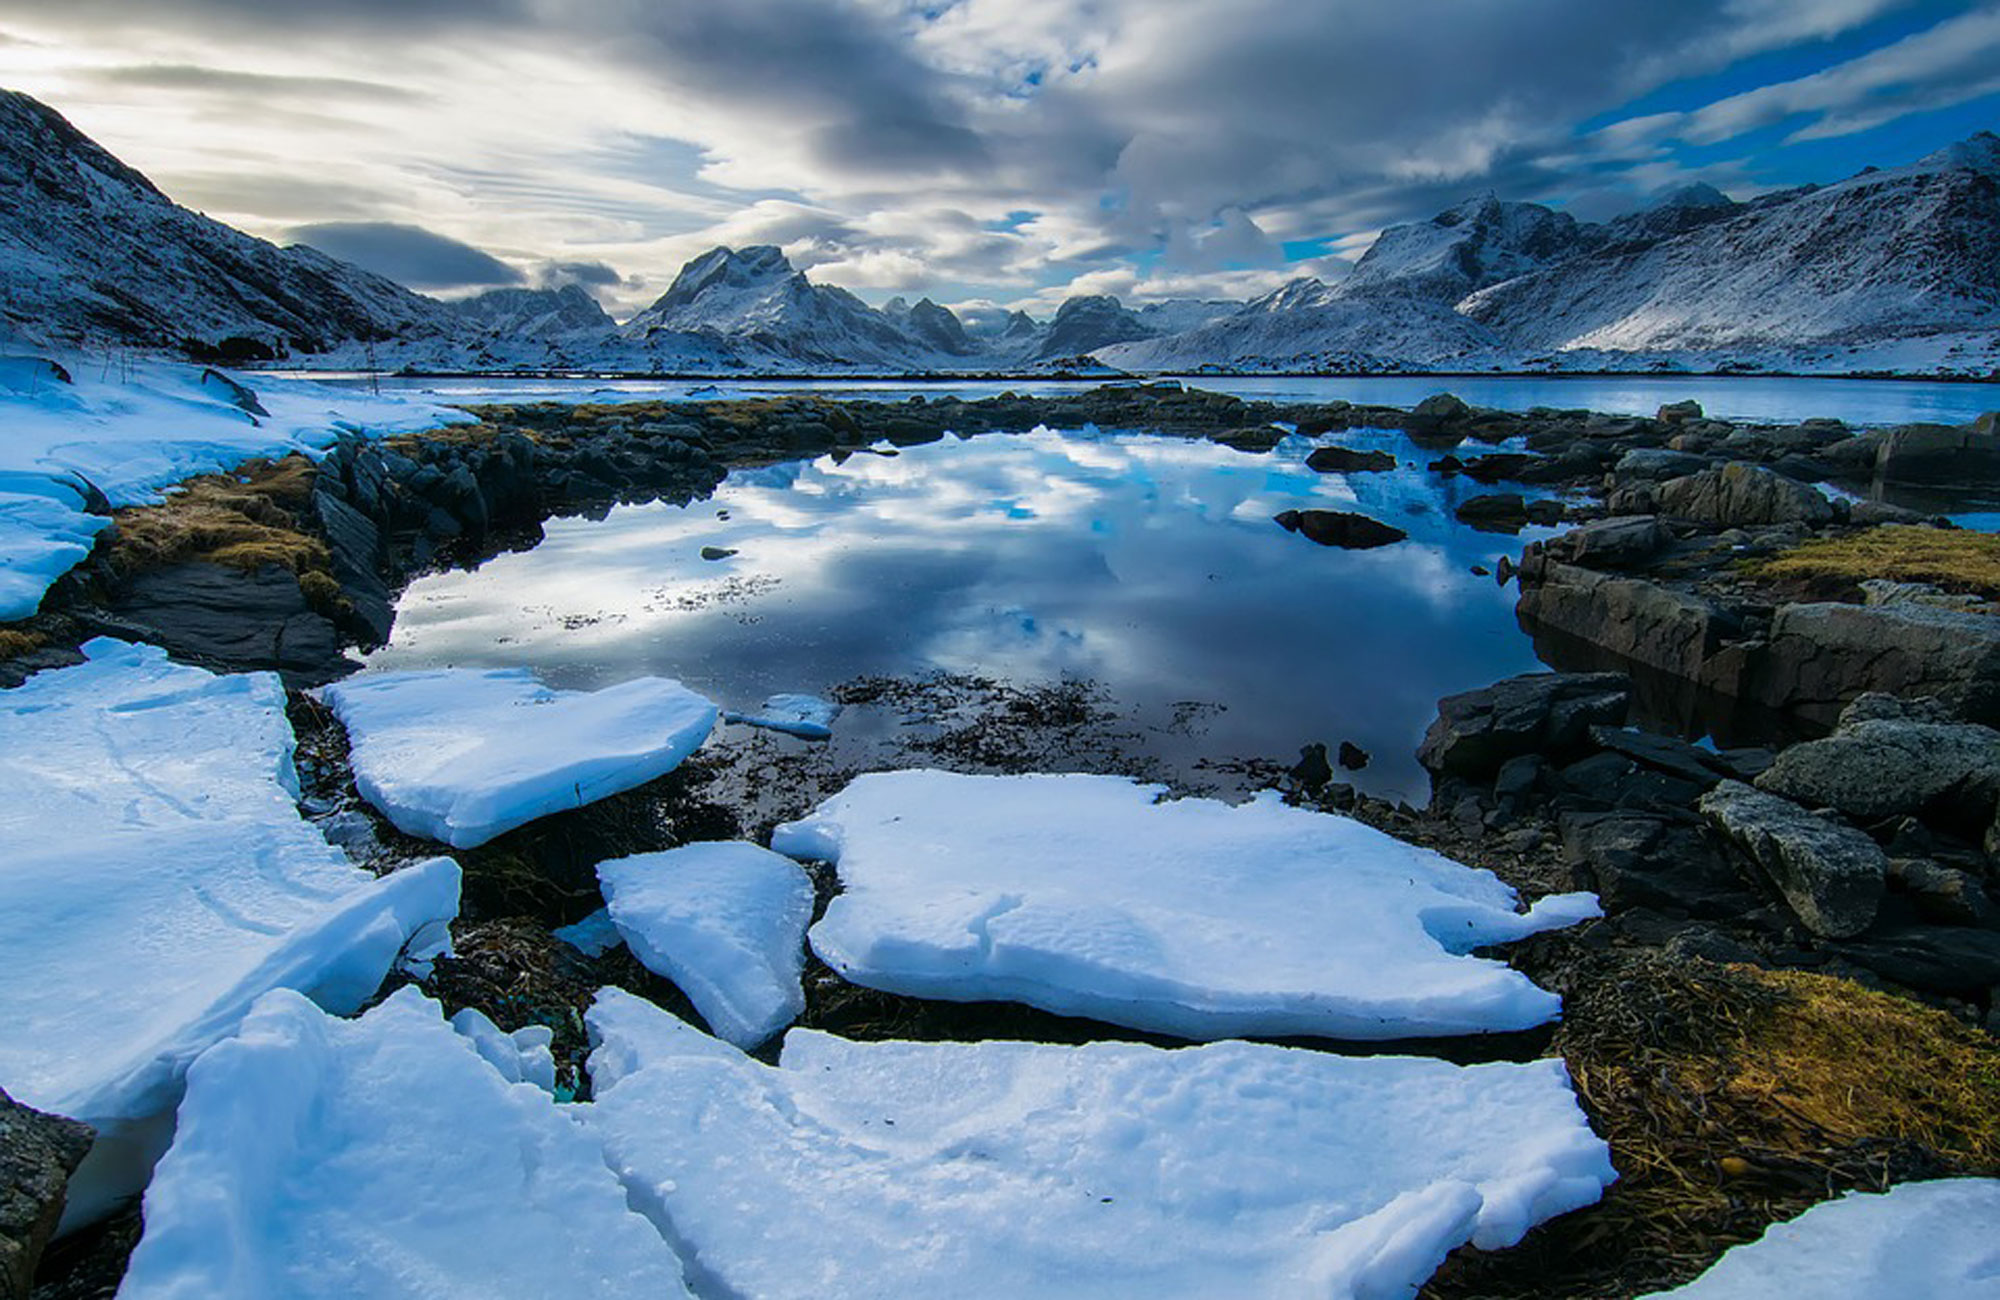 Voyage Norvège - fjords hiver - Amplitudes